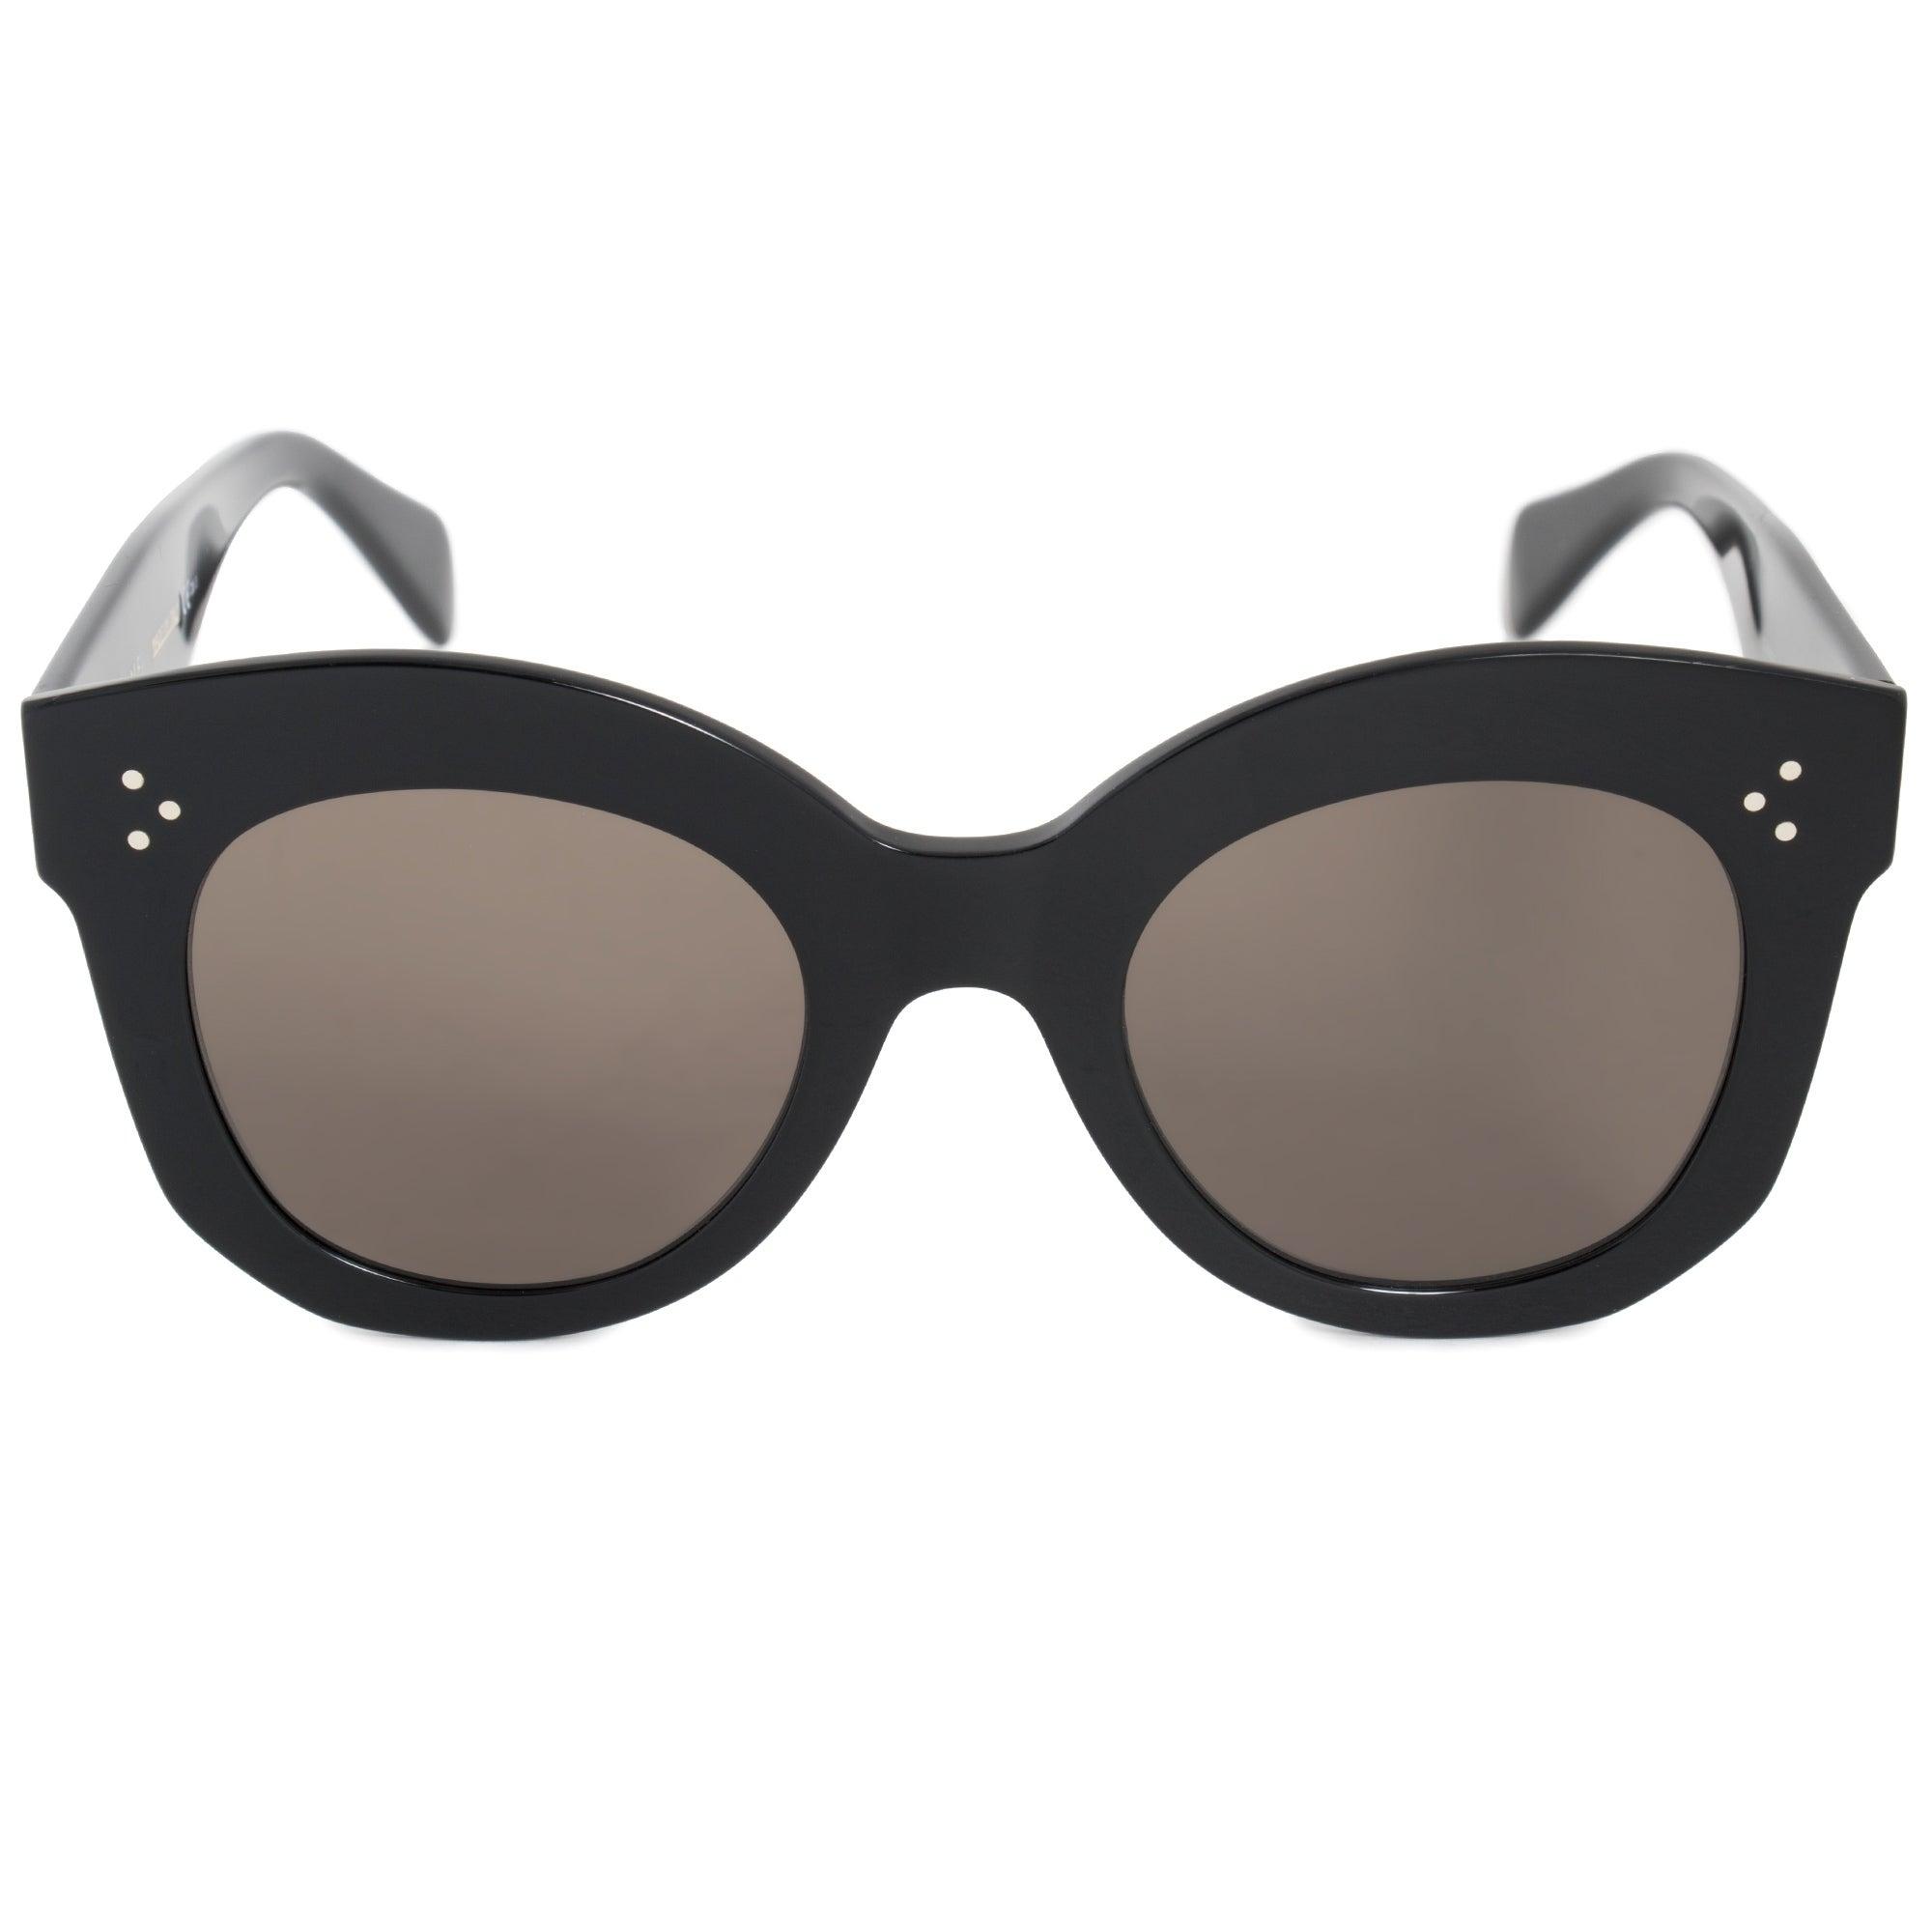 de28874b7857 Celine Women s Sunglasses